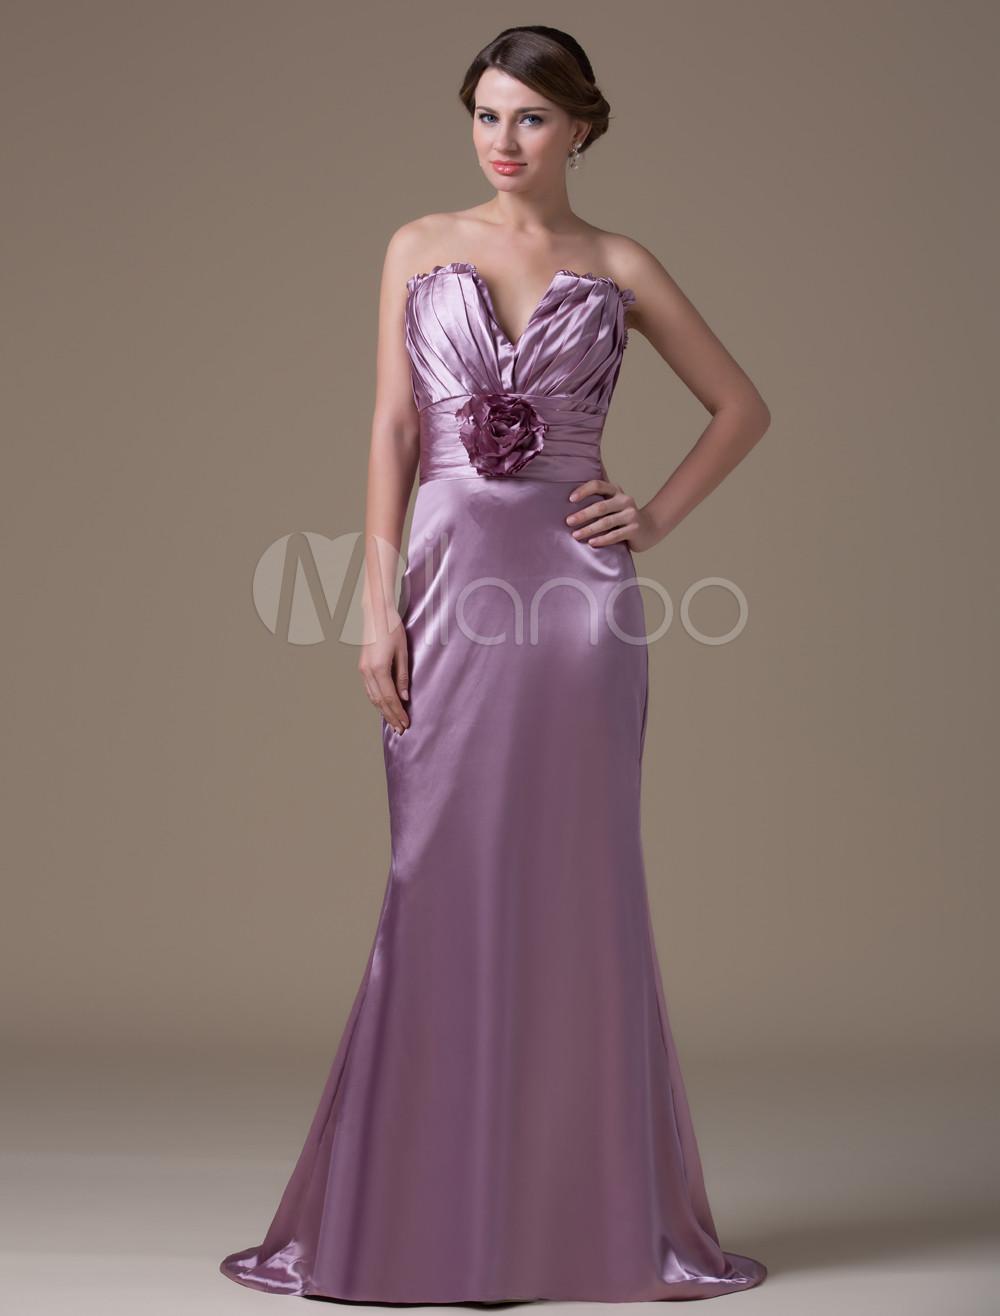 Encantador Profundas Vestidos De Las Damas De Color Púrpura Viñeta ...